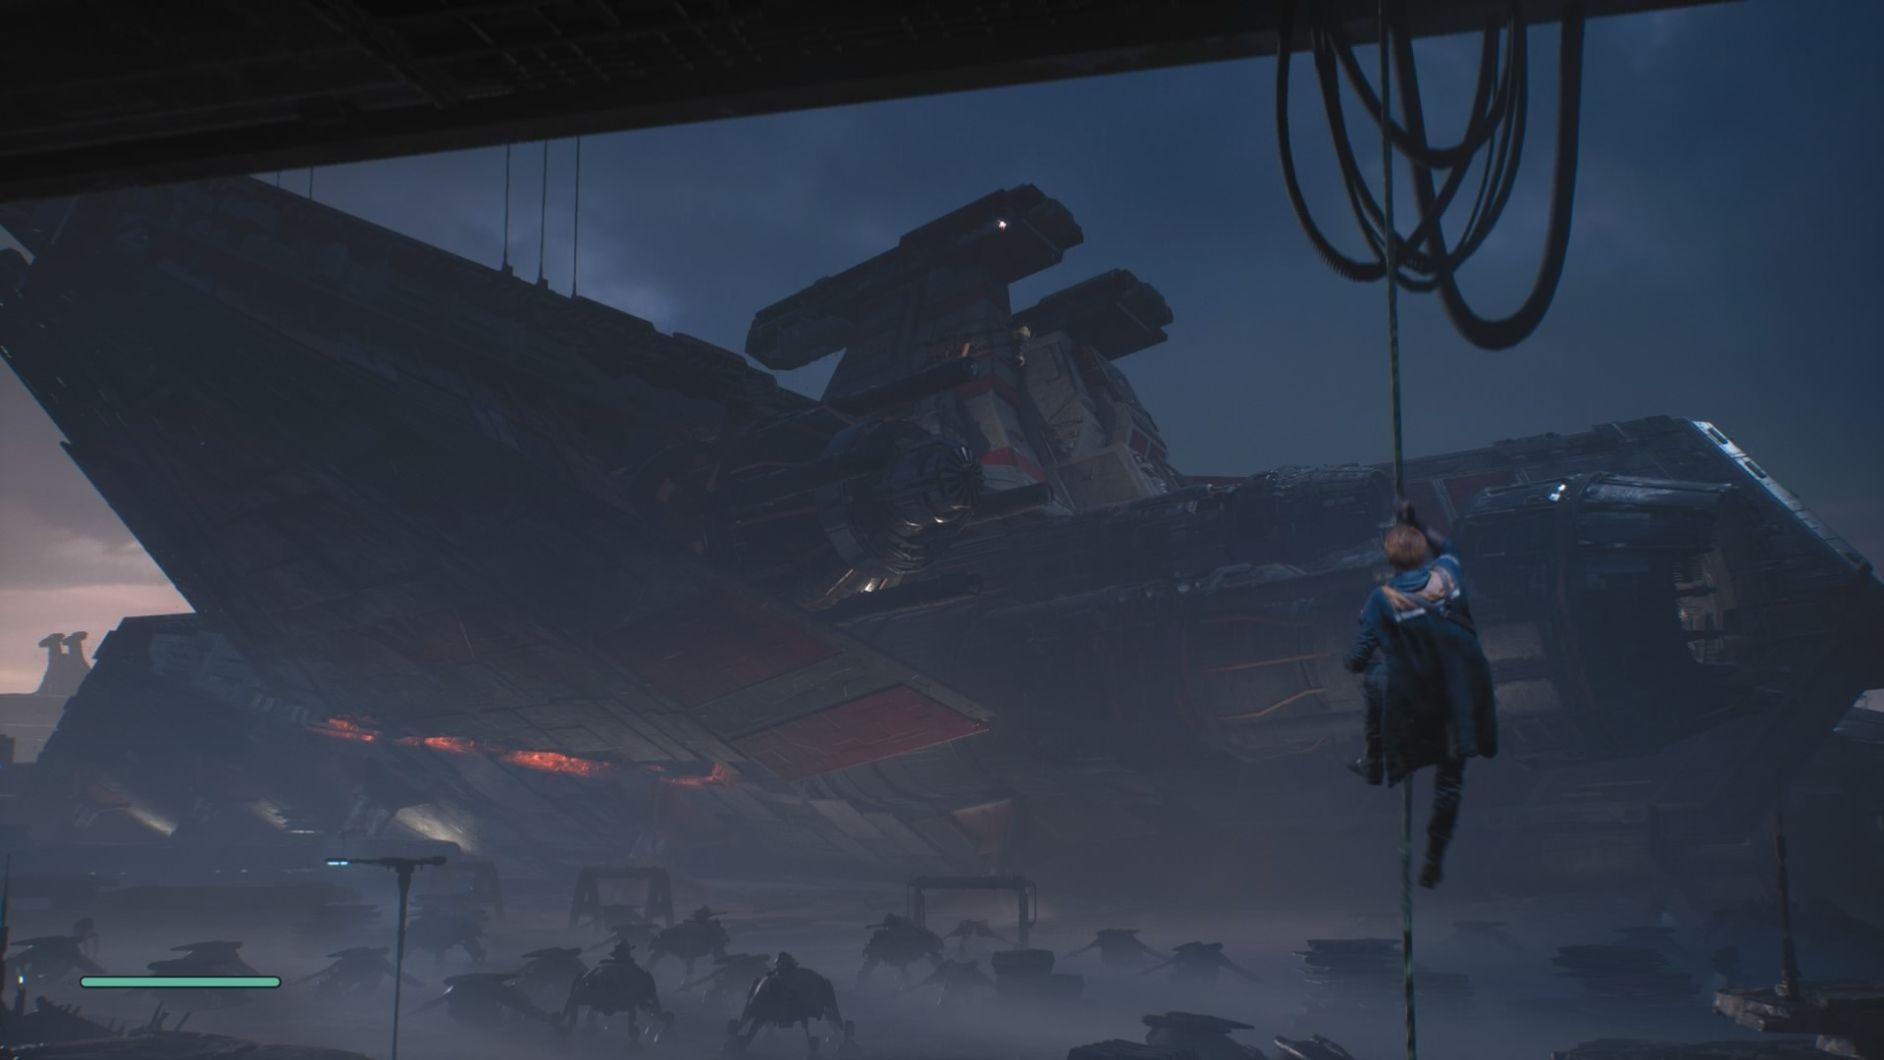 Star Wars rymdskepp